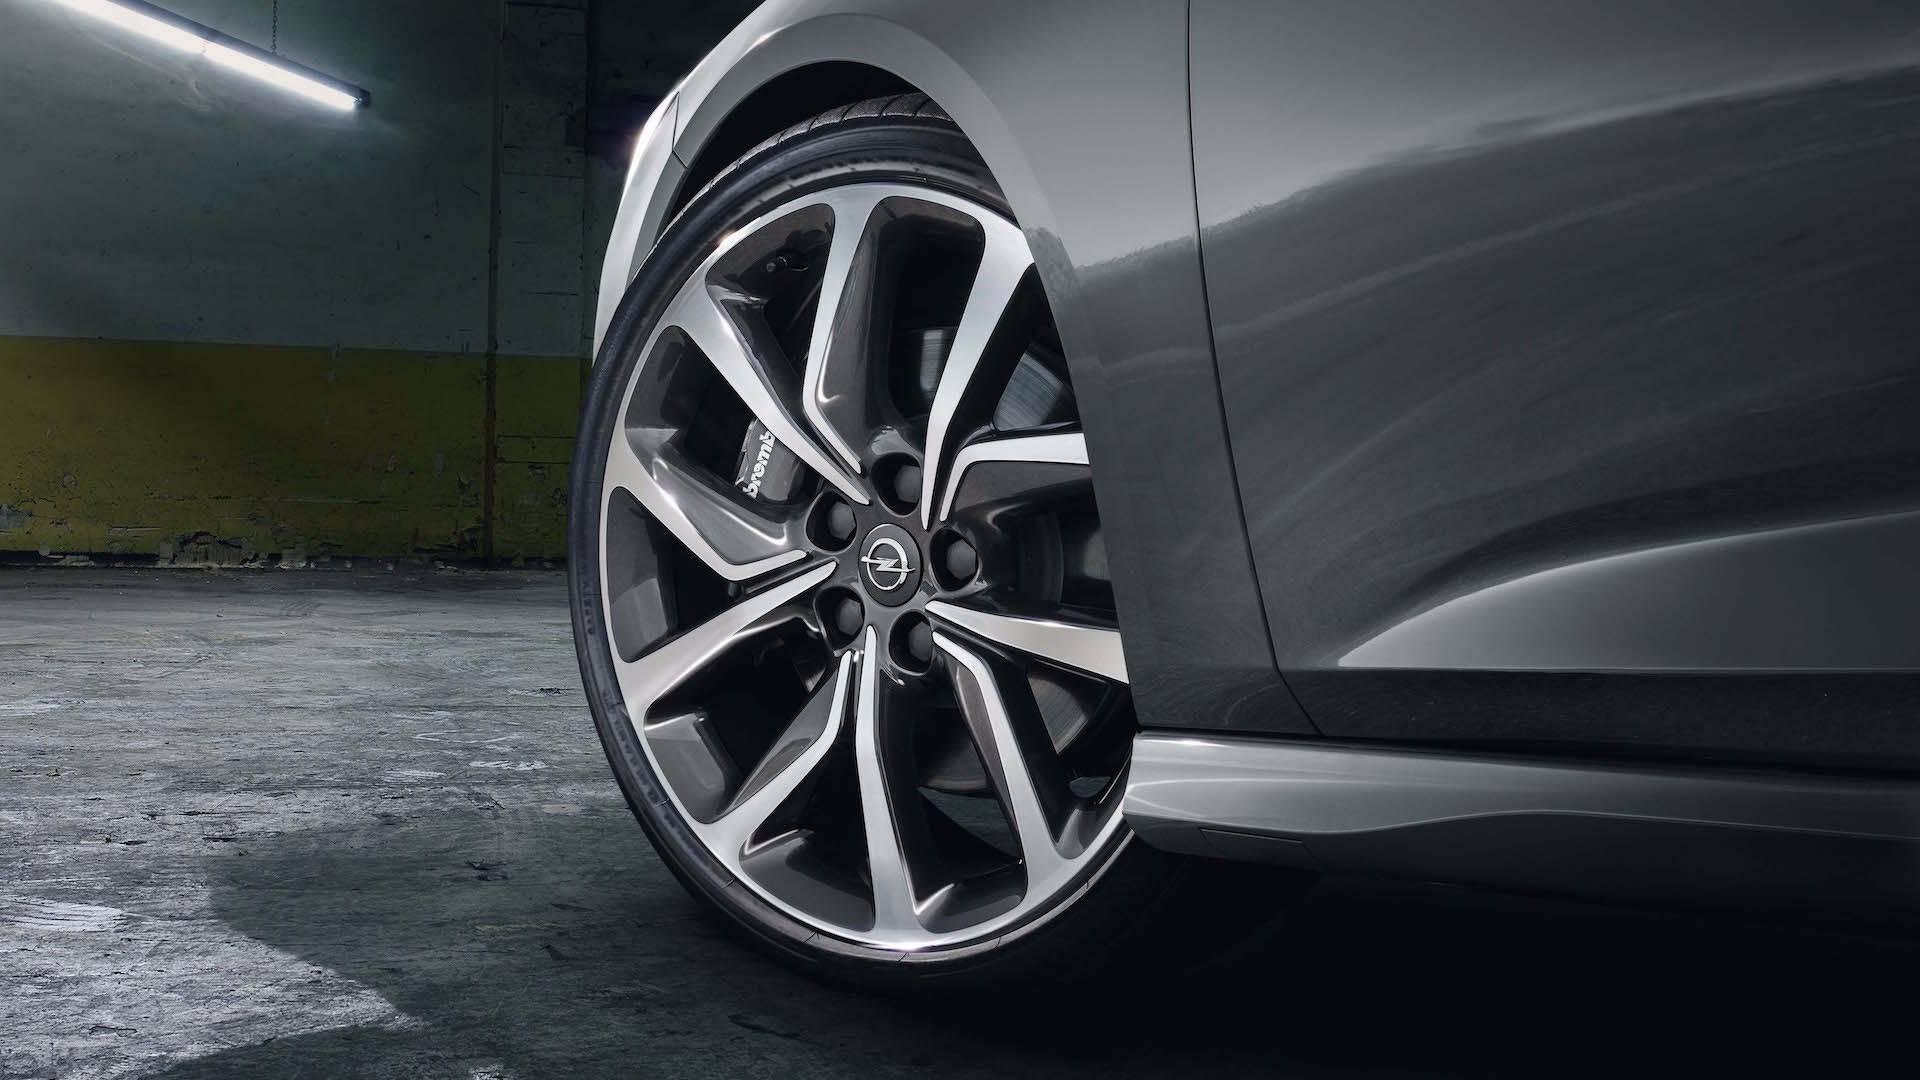 Opel_Insignia_GSi_Nürburgring_05